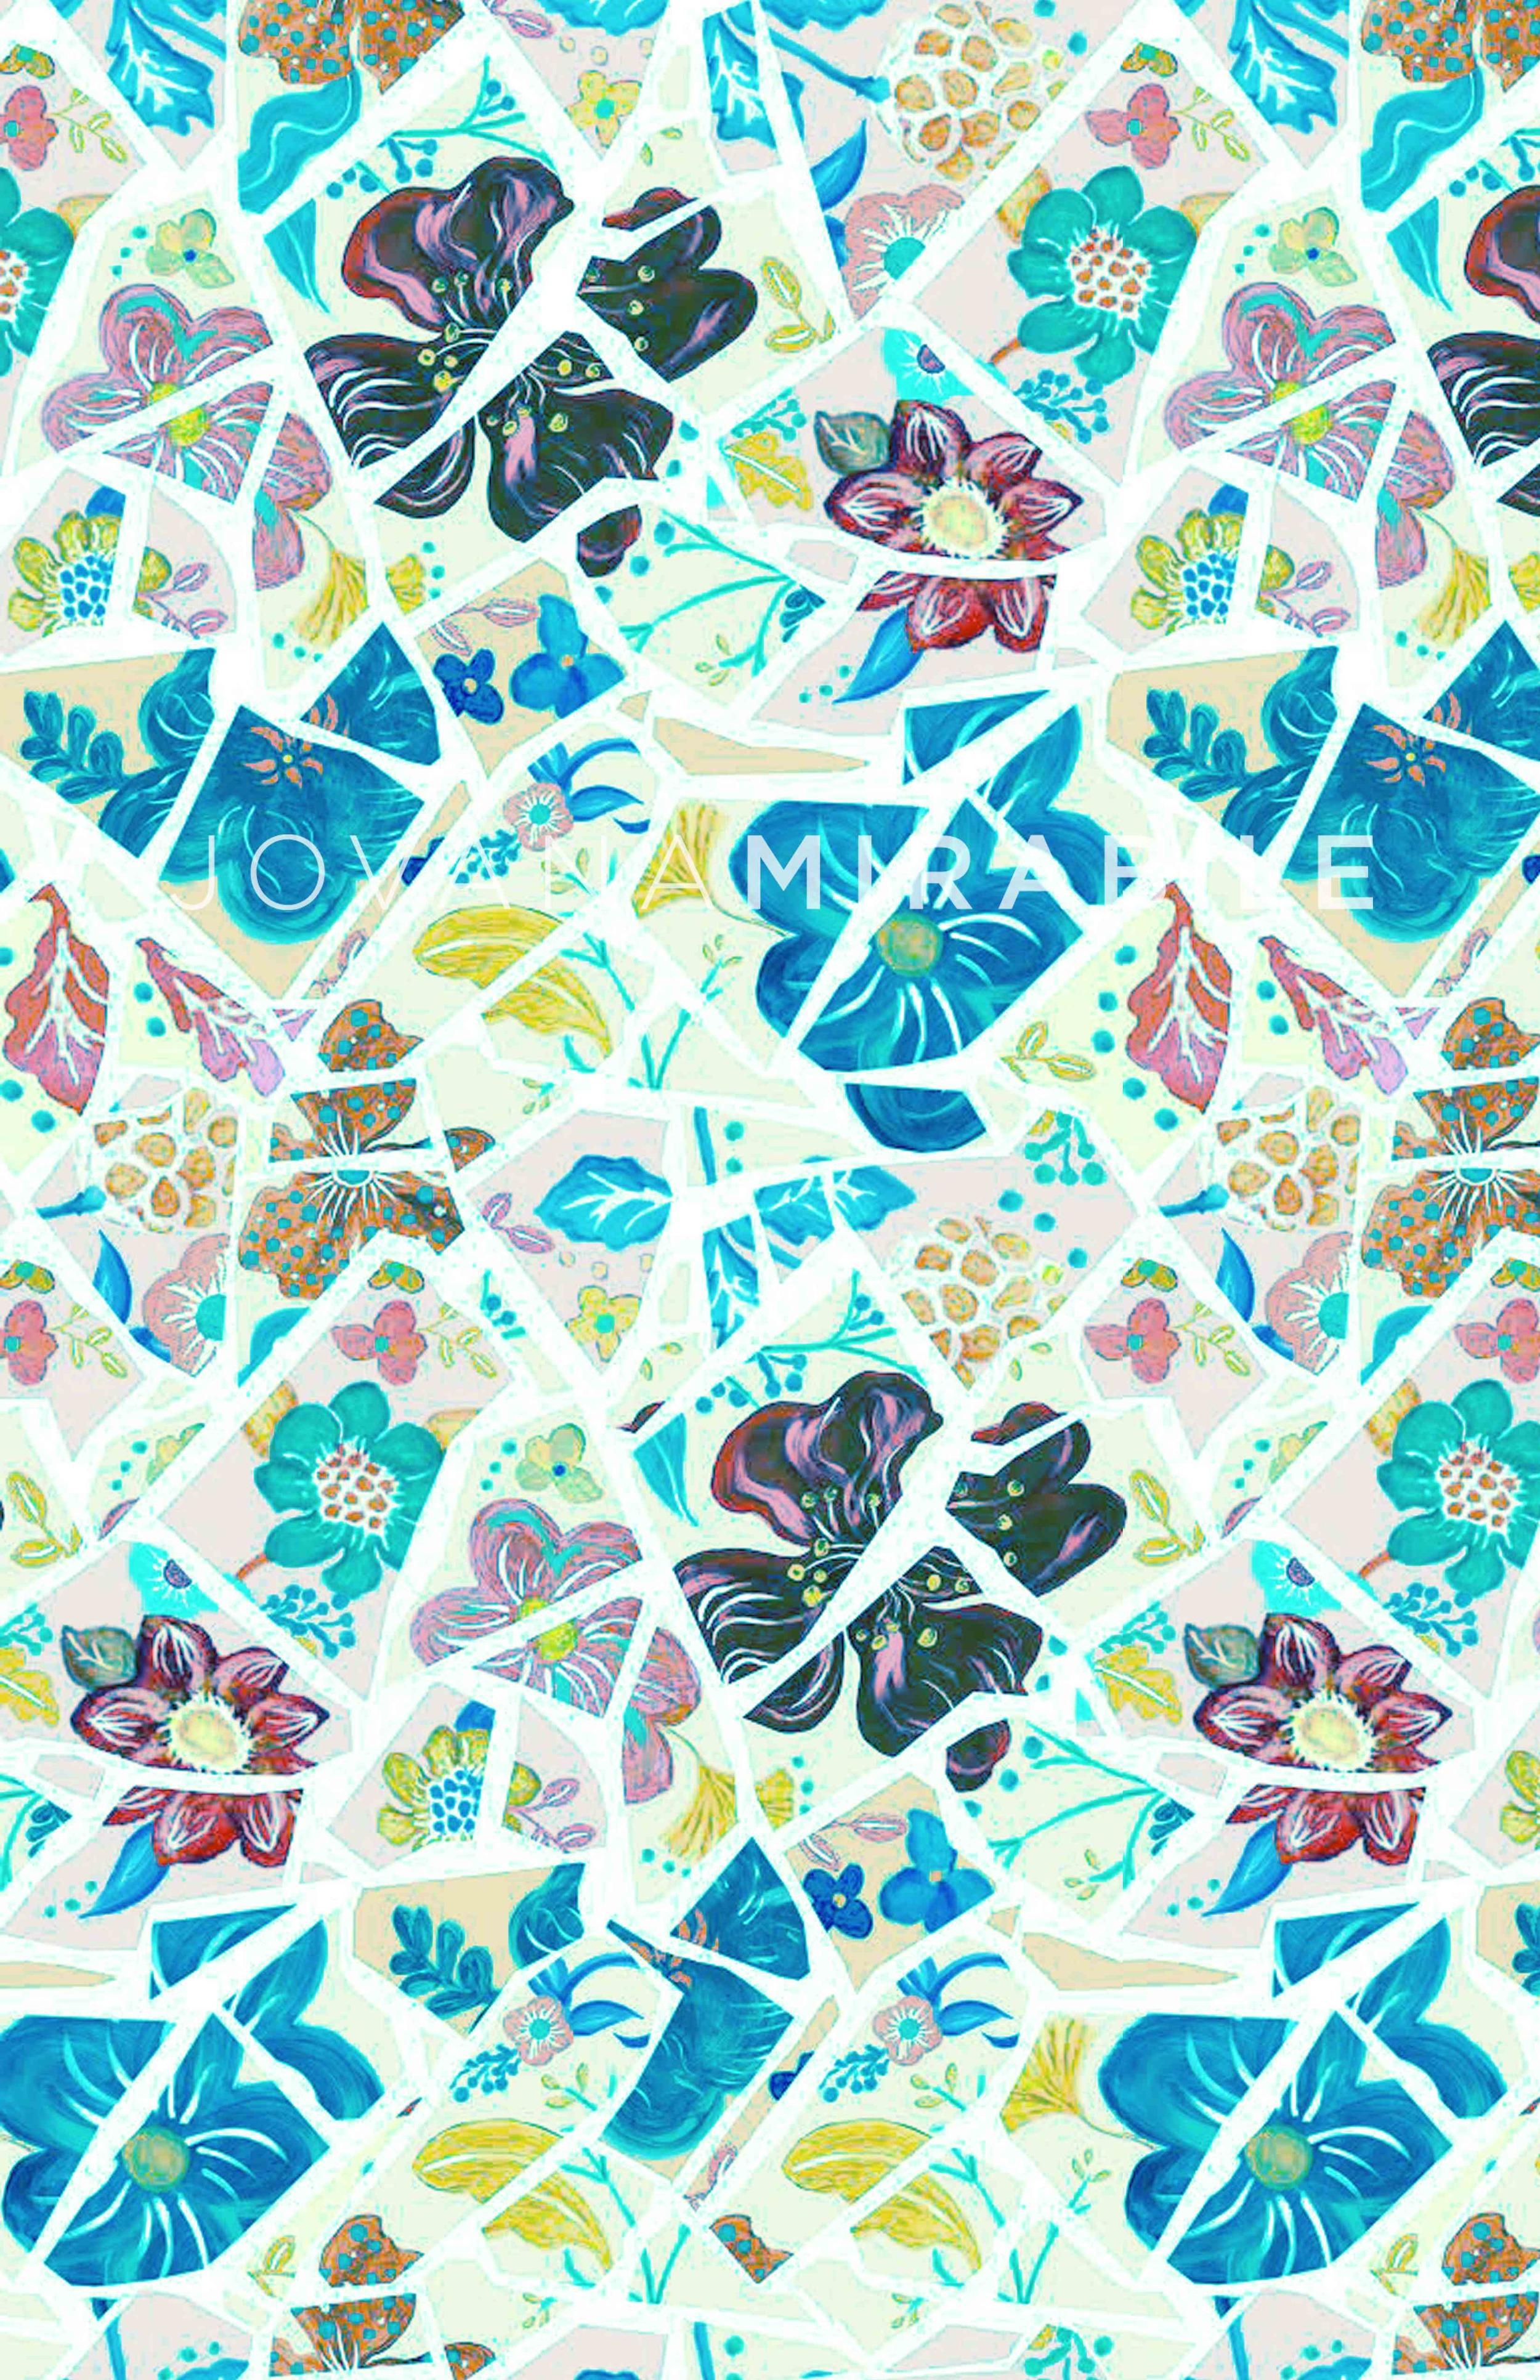 Mosaic floral2.jpg